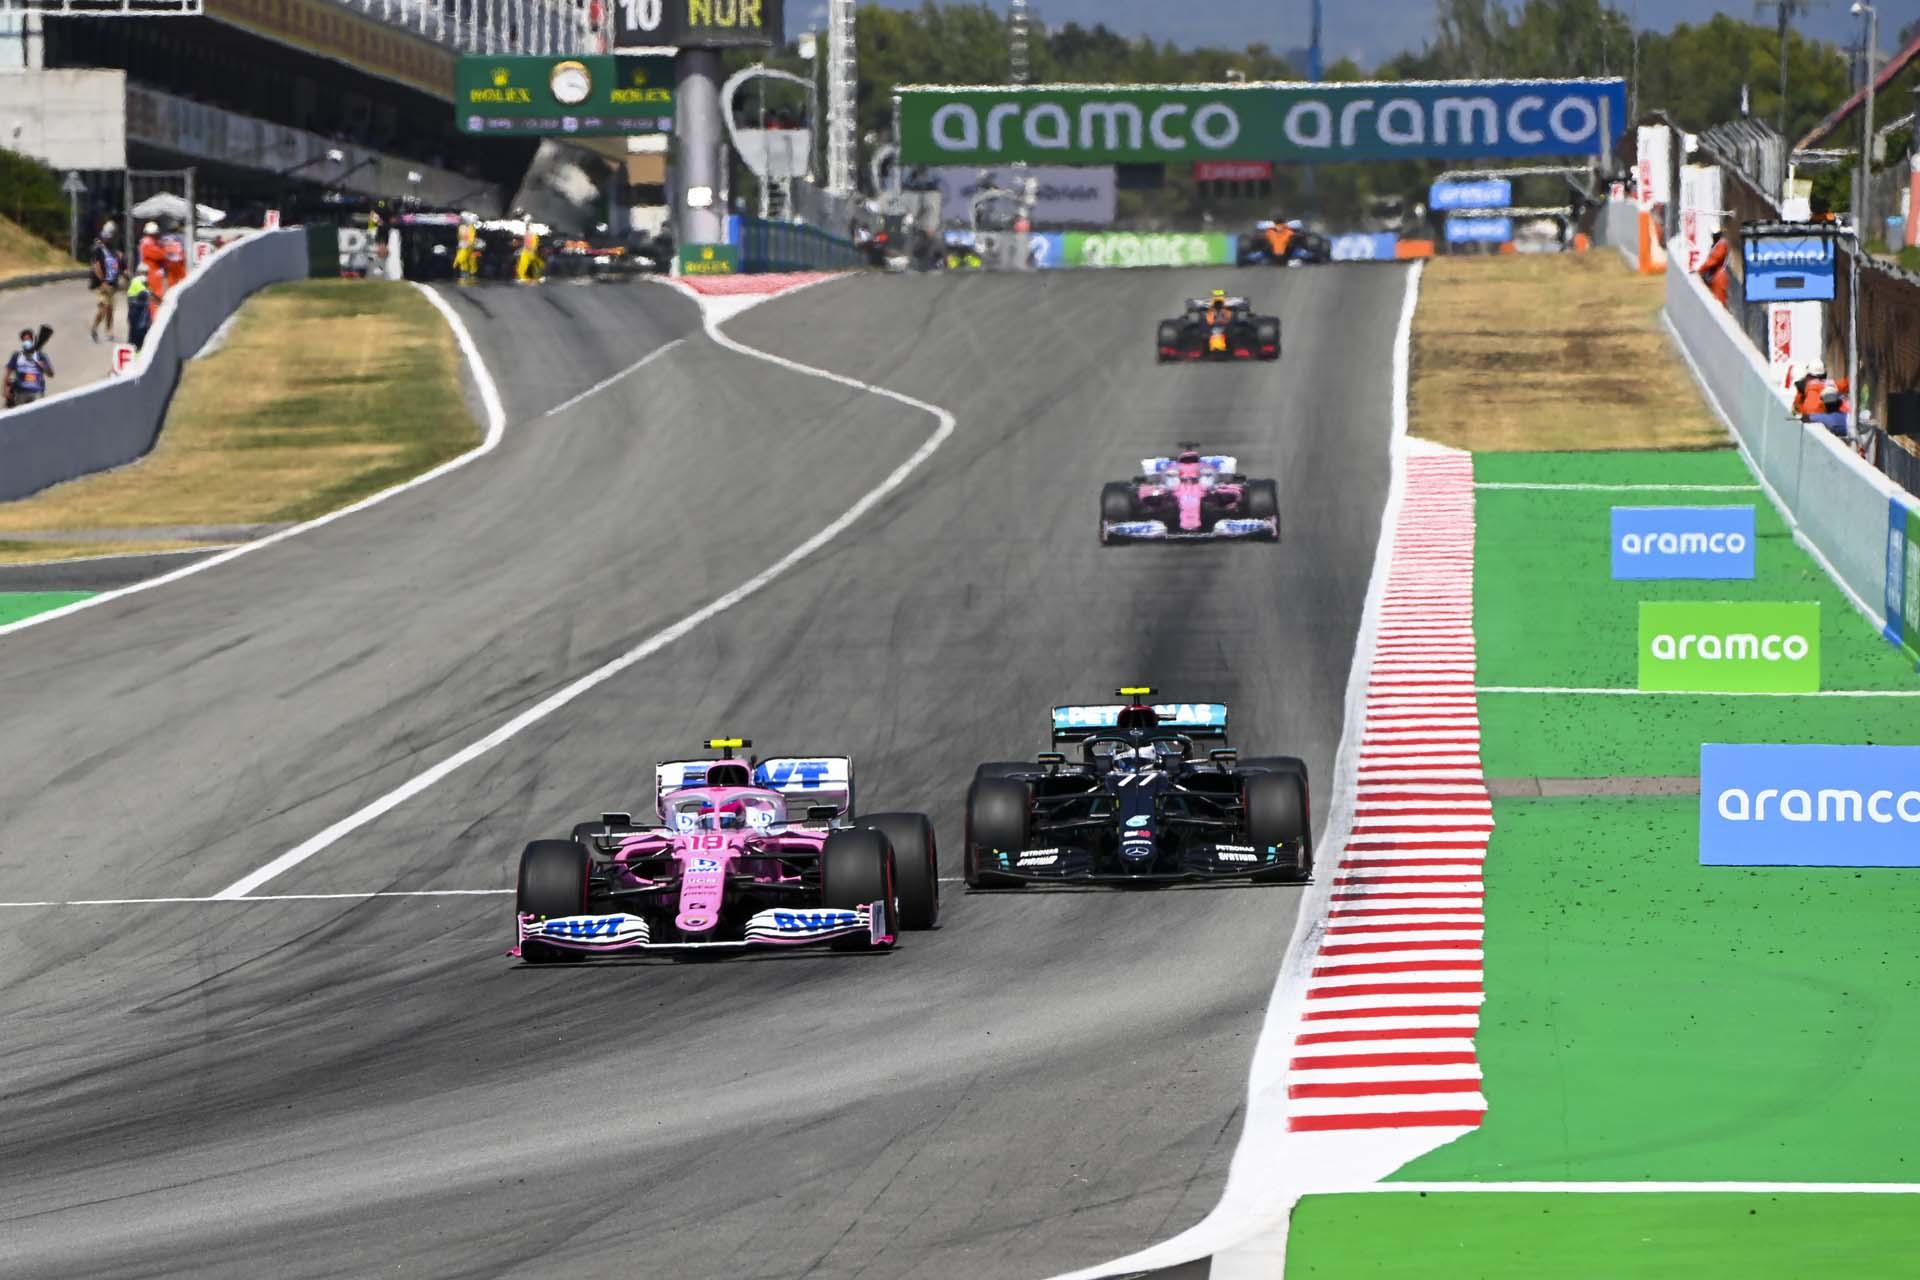 2020SpanishGPSunday_RacingP_GP2006_131732MS2_2418 (2)